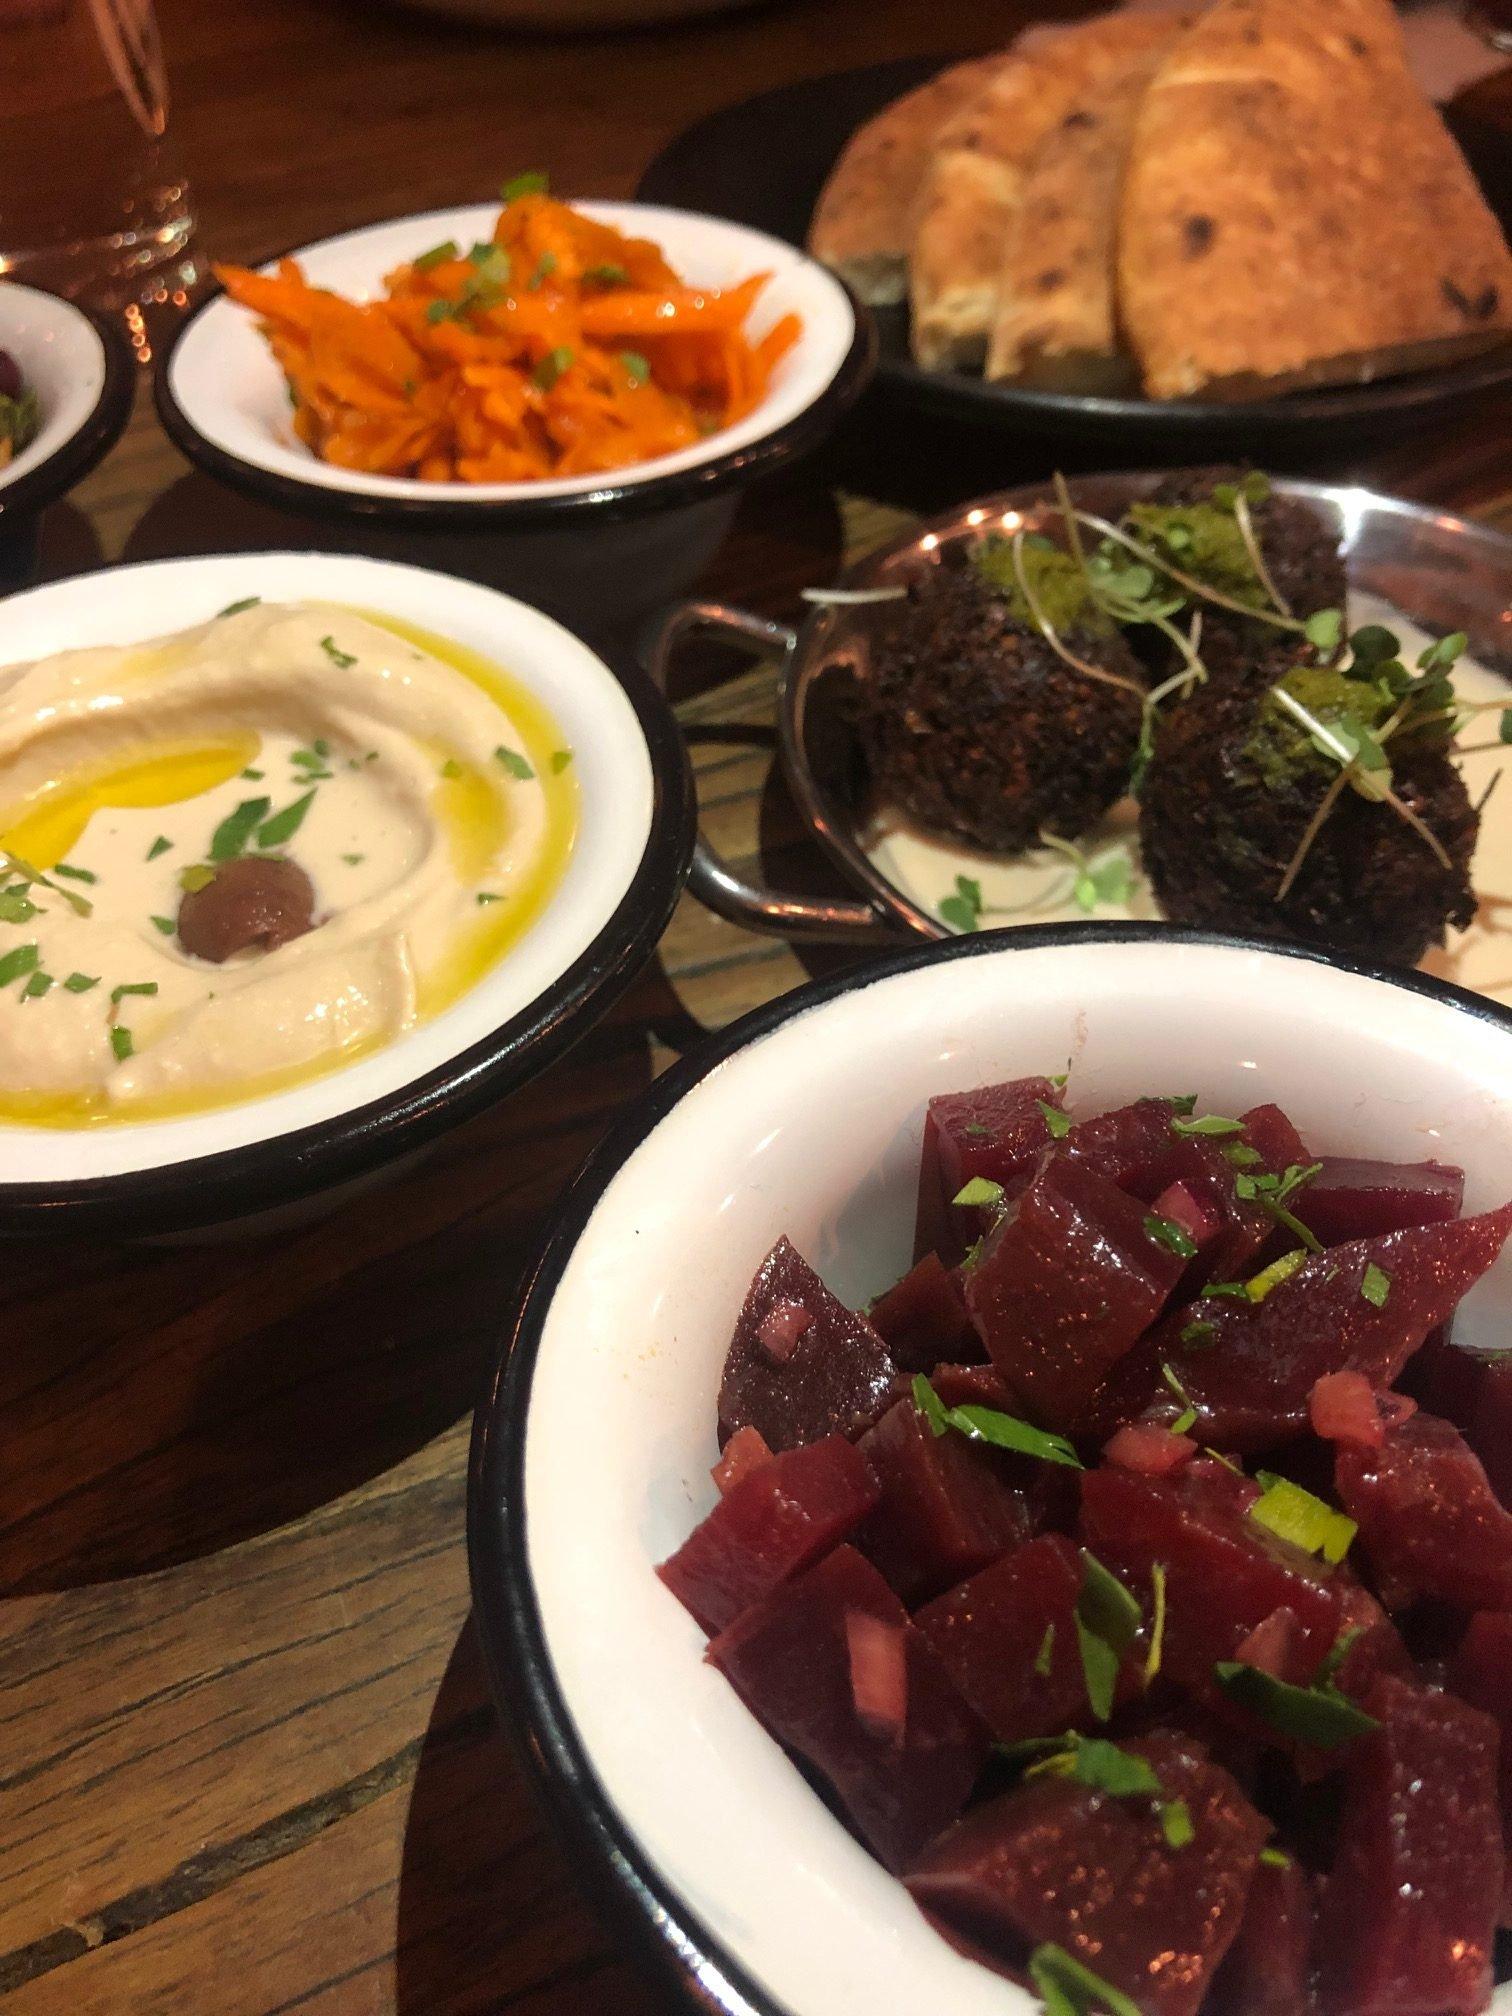 Israel food is the best way to vegan travel